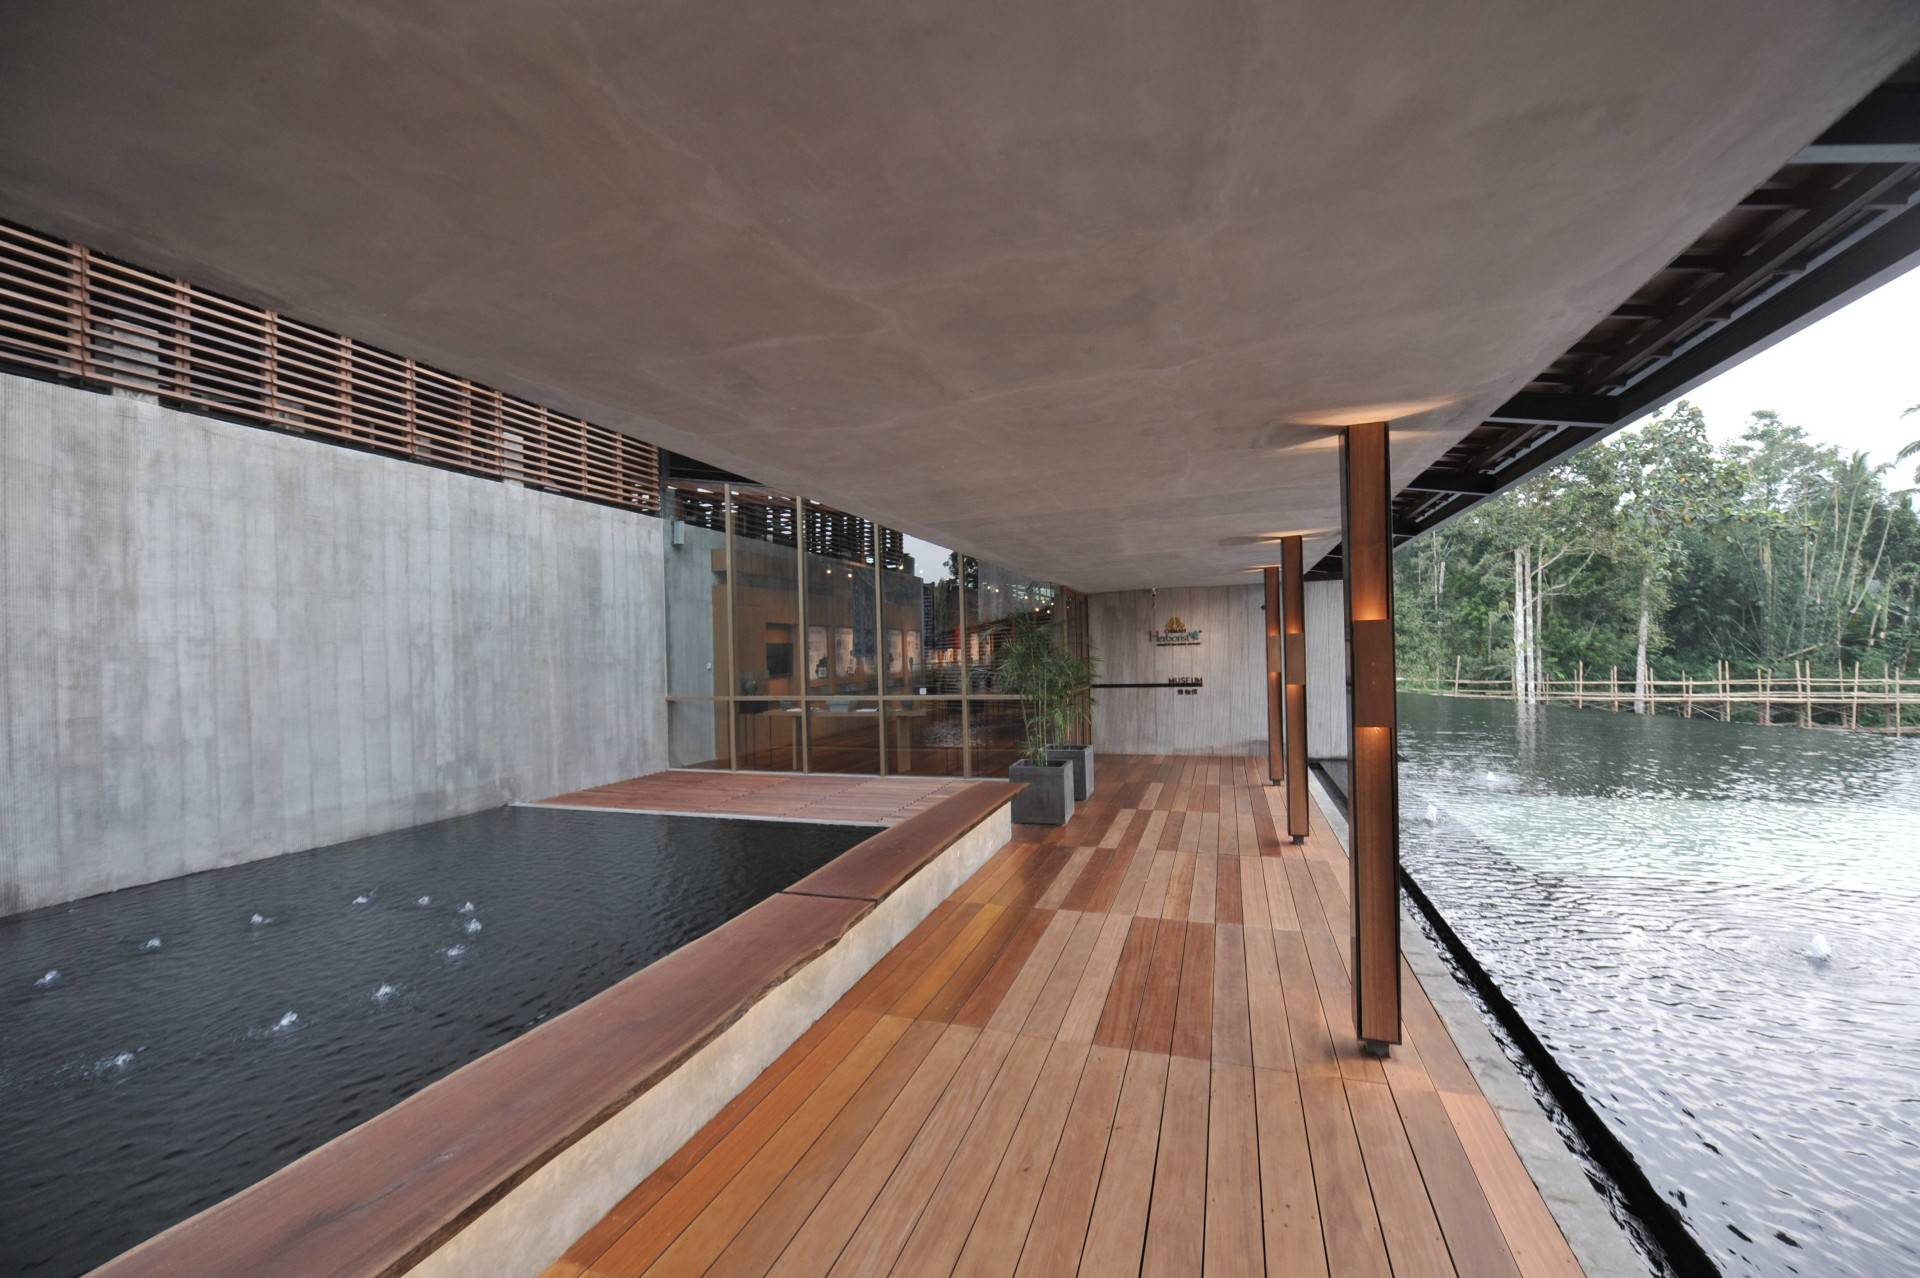 Andramatin Sg Bali, Indonesia Bali, Indonesia Pond Tropis  8249